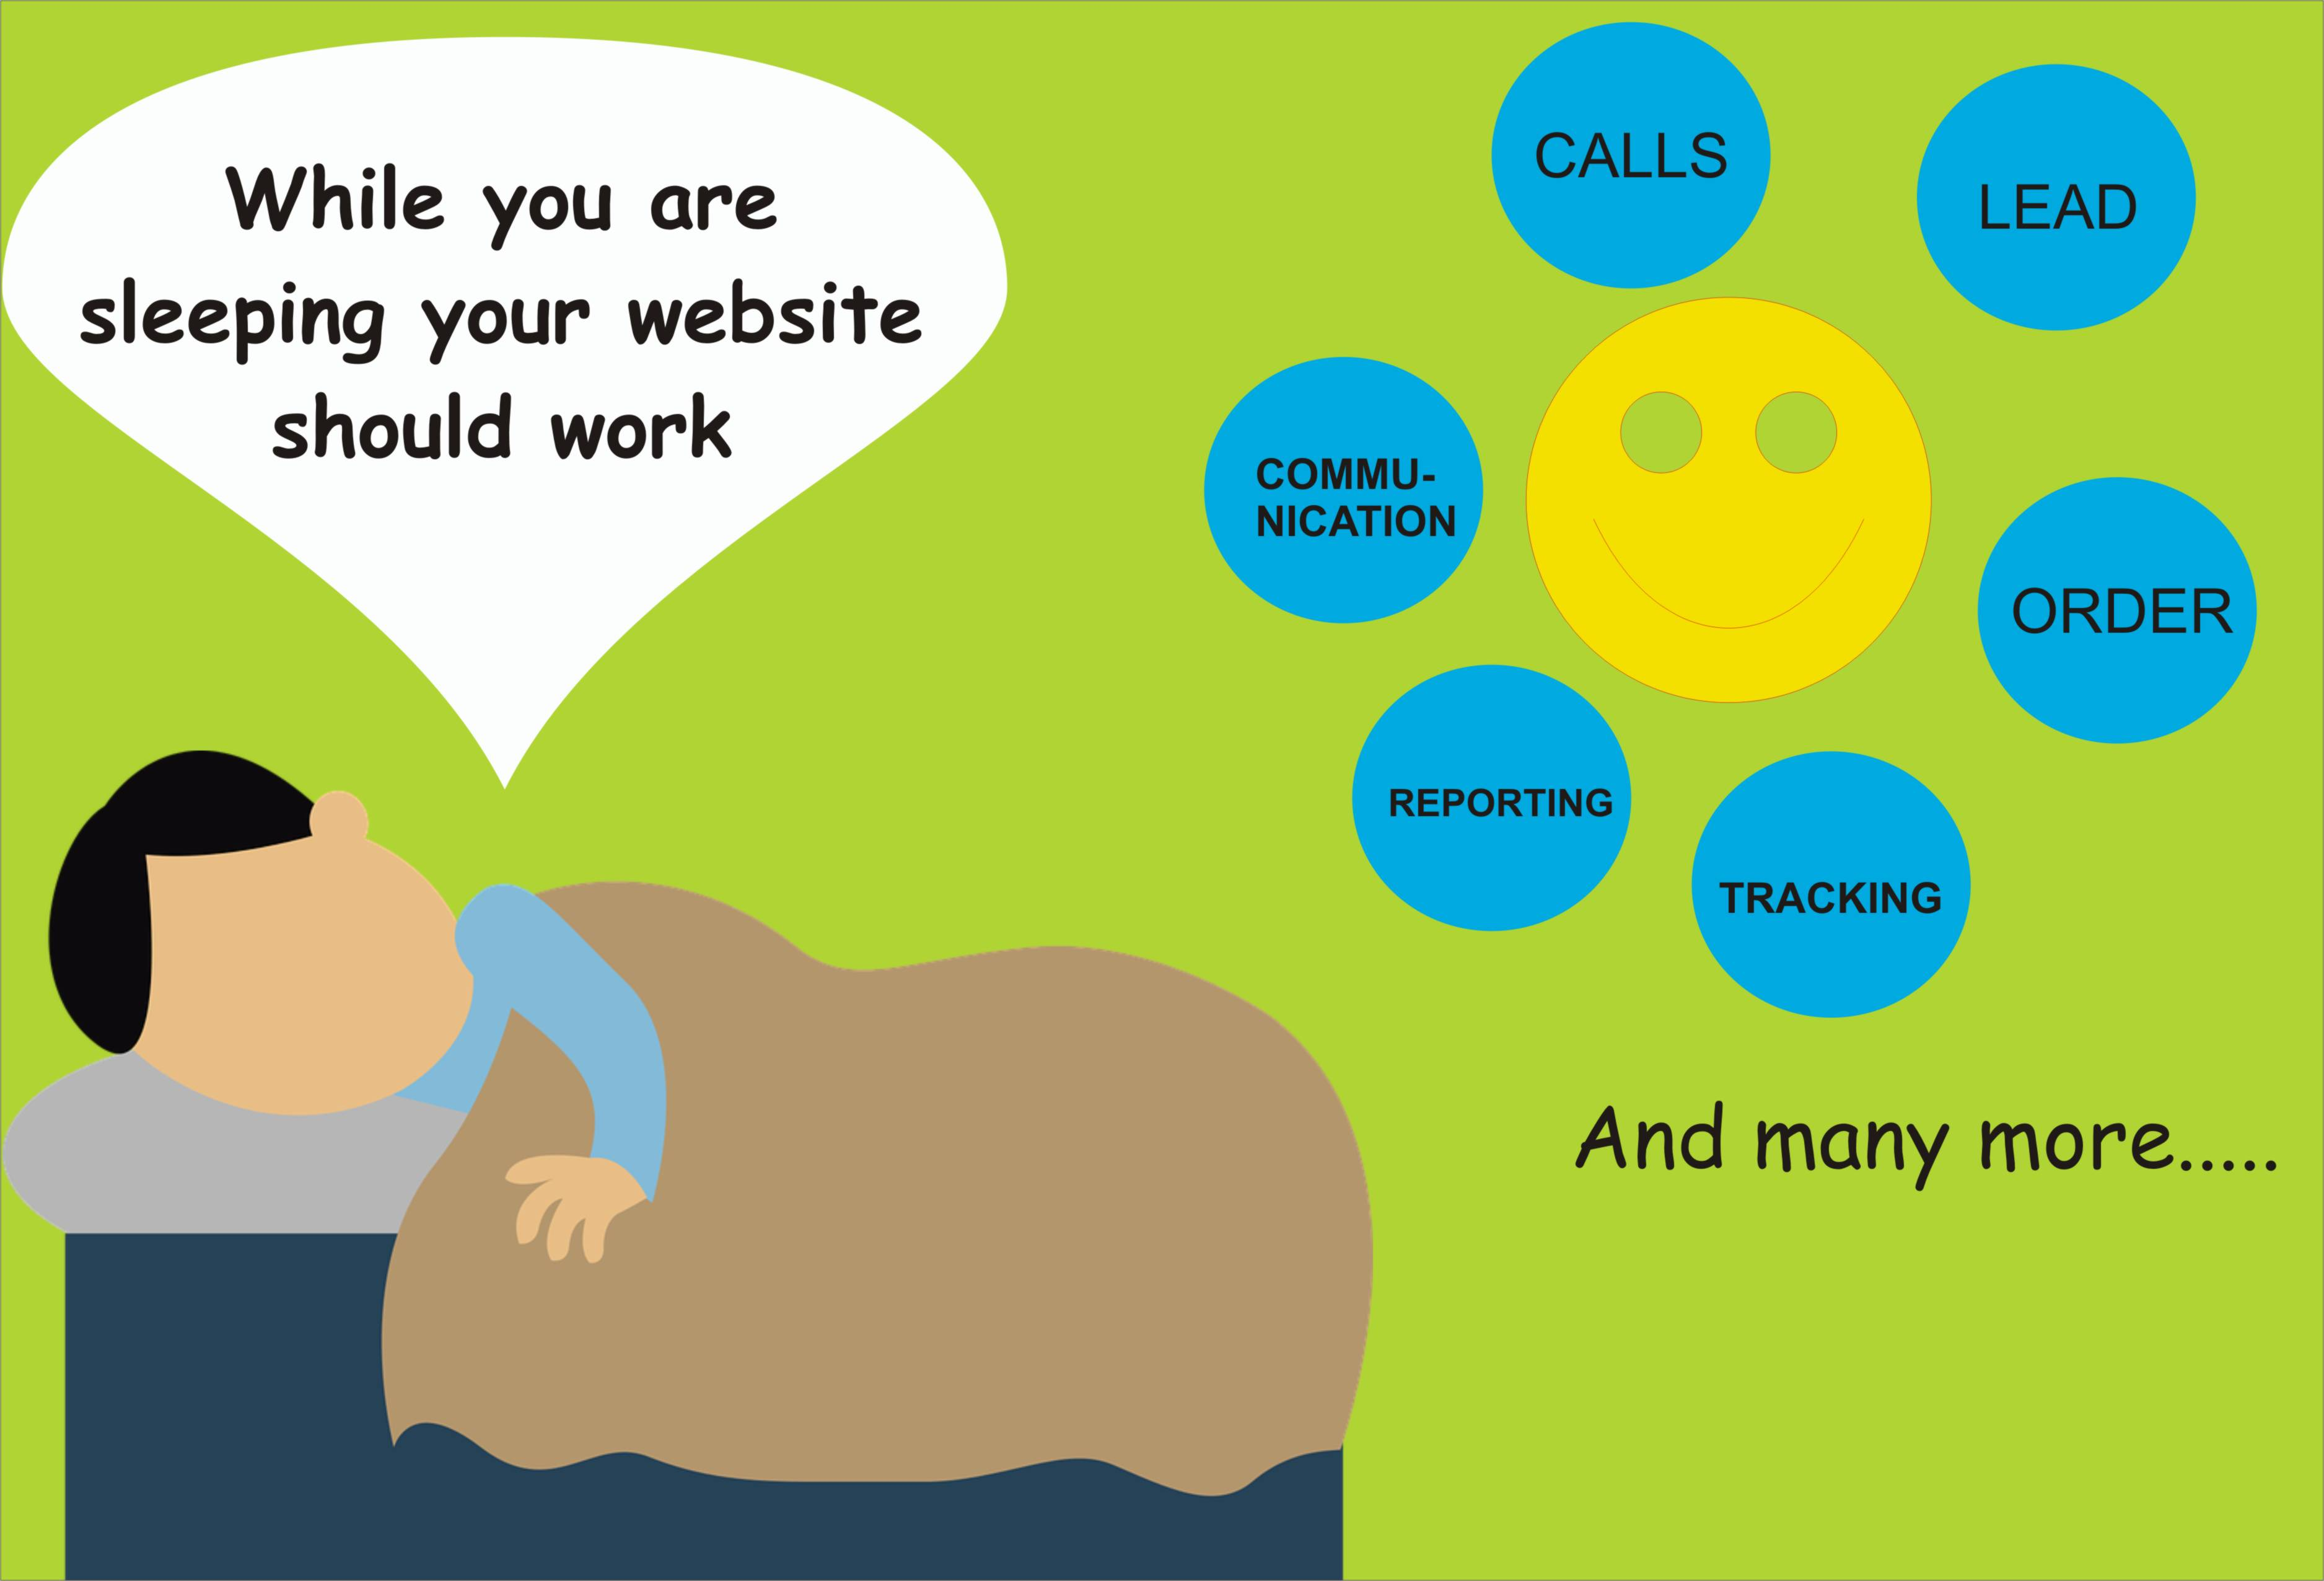 Strategic web development - While Sleeping